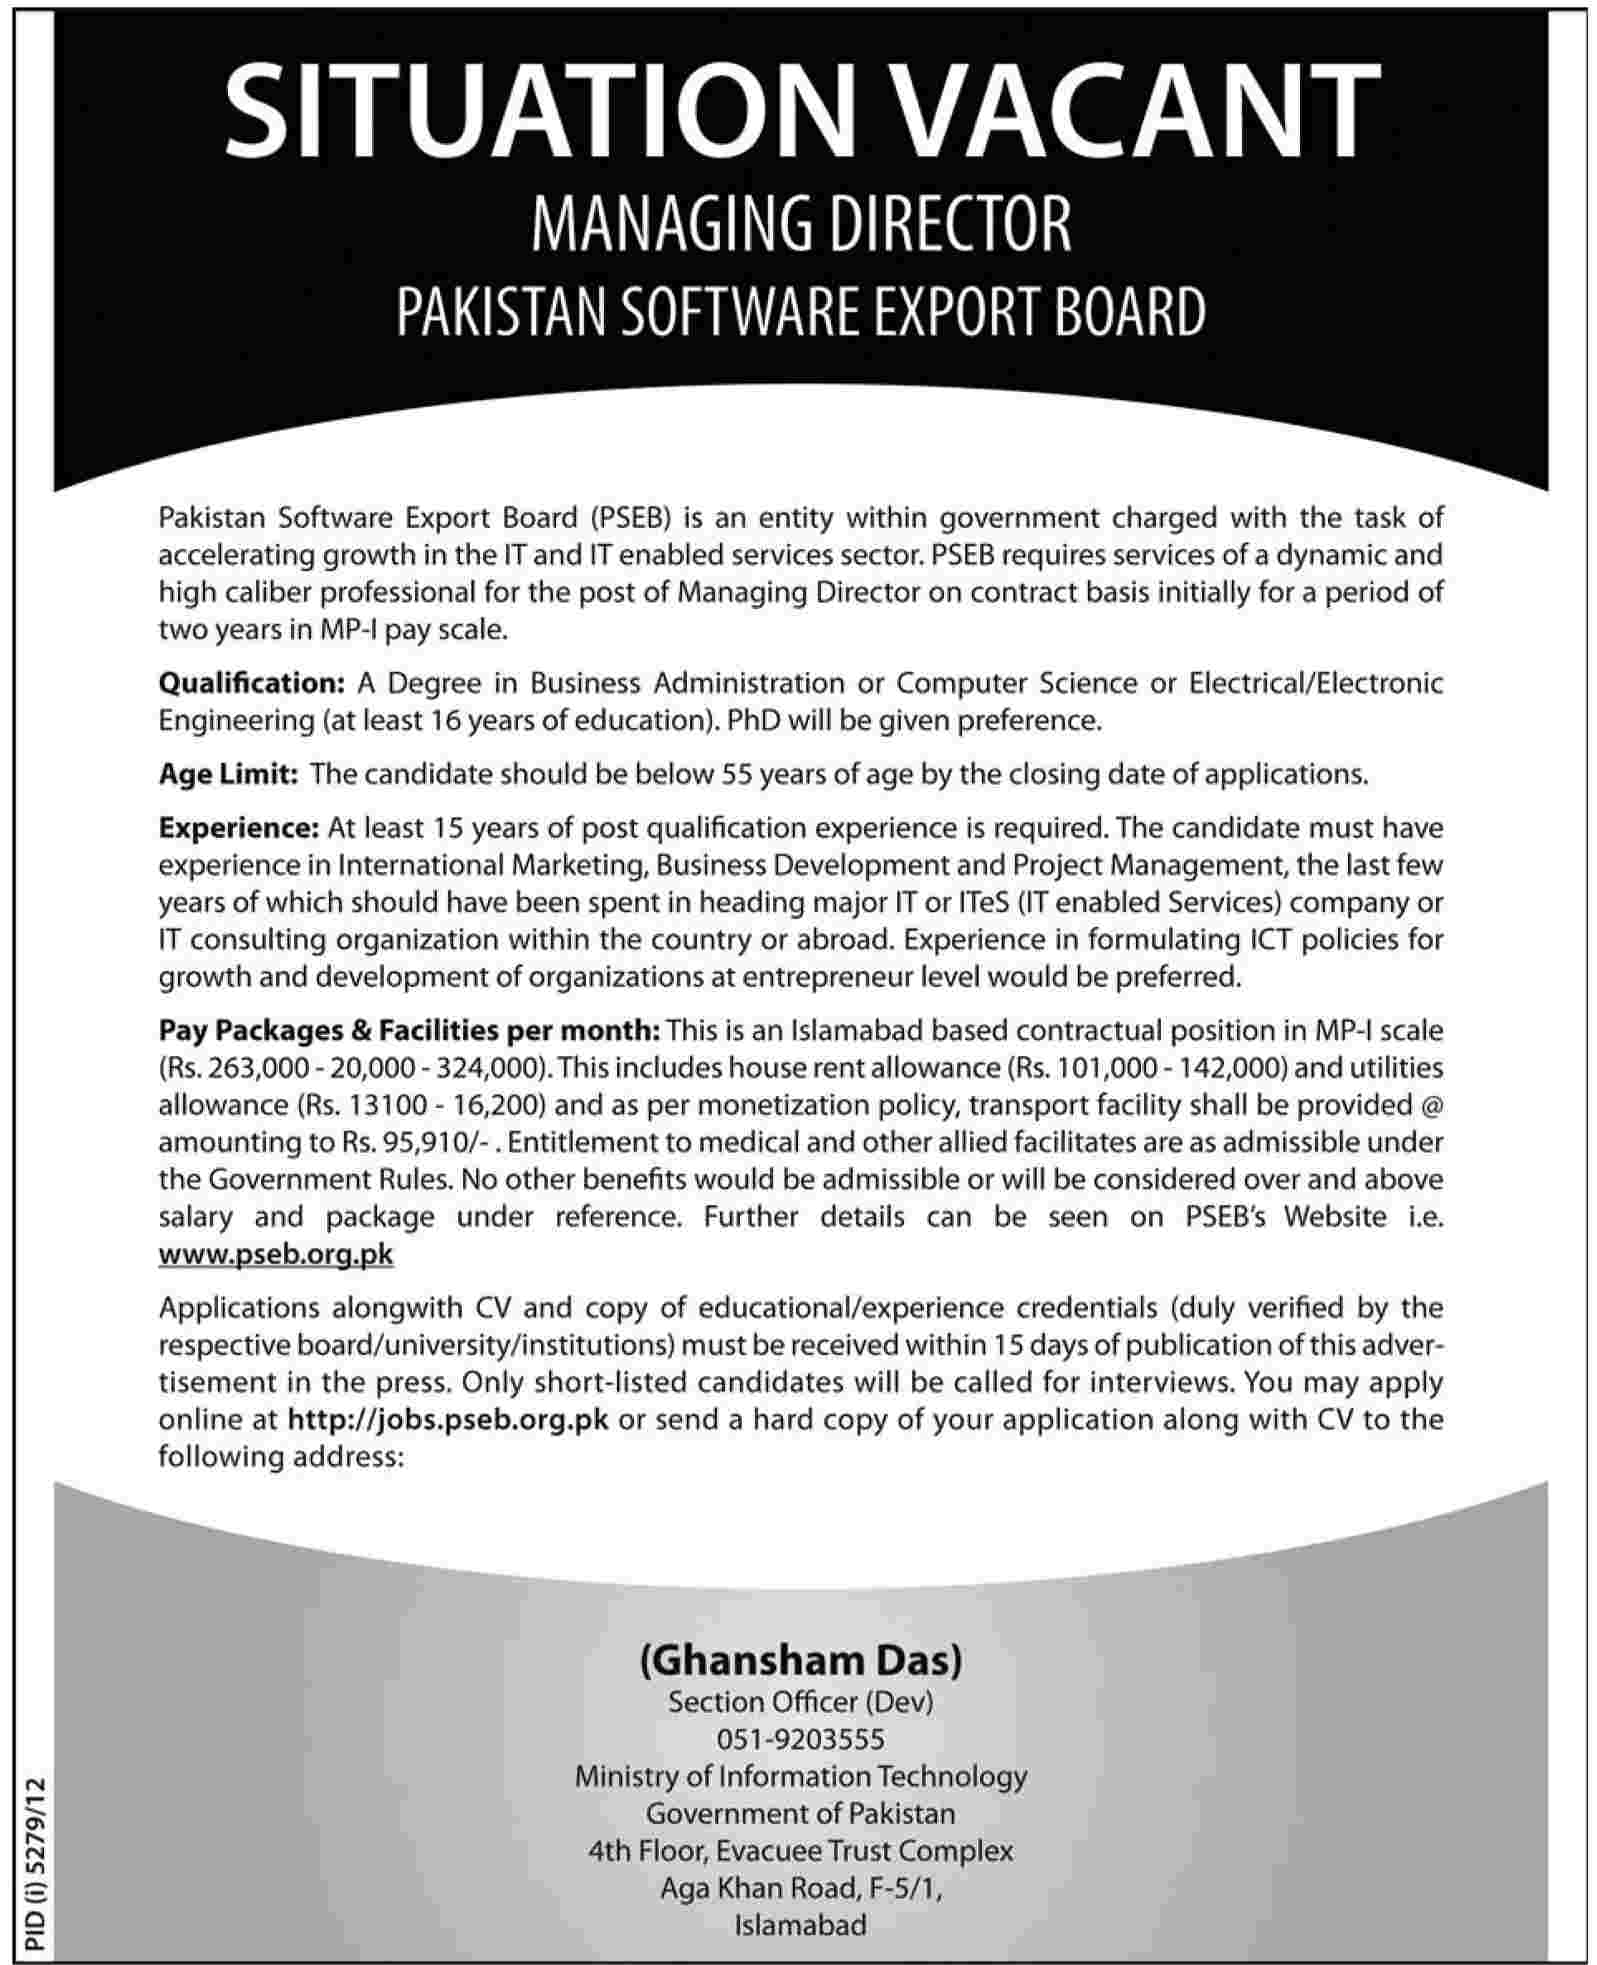 Jobs for Managing Director in Pakistan Software Export Board Islamabad